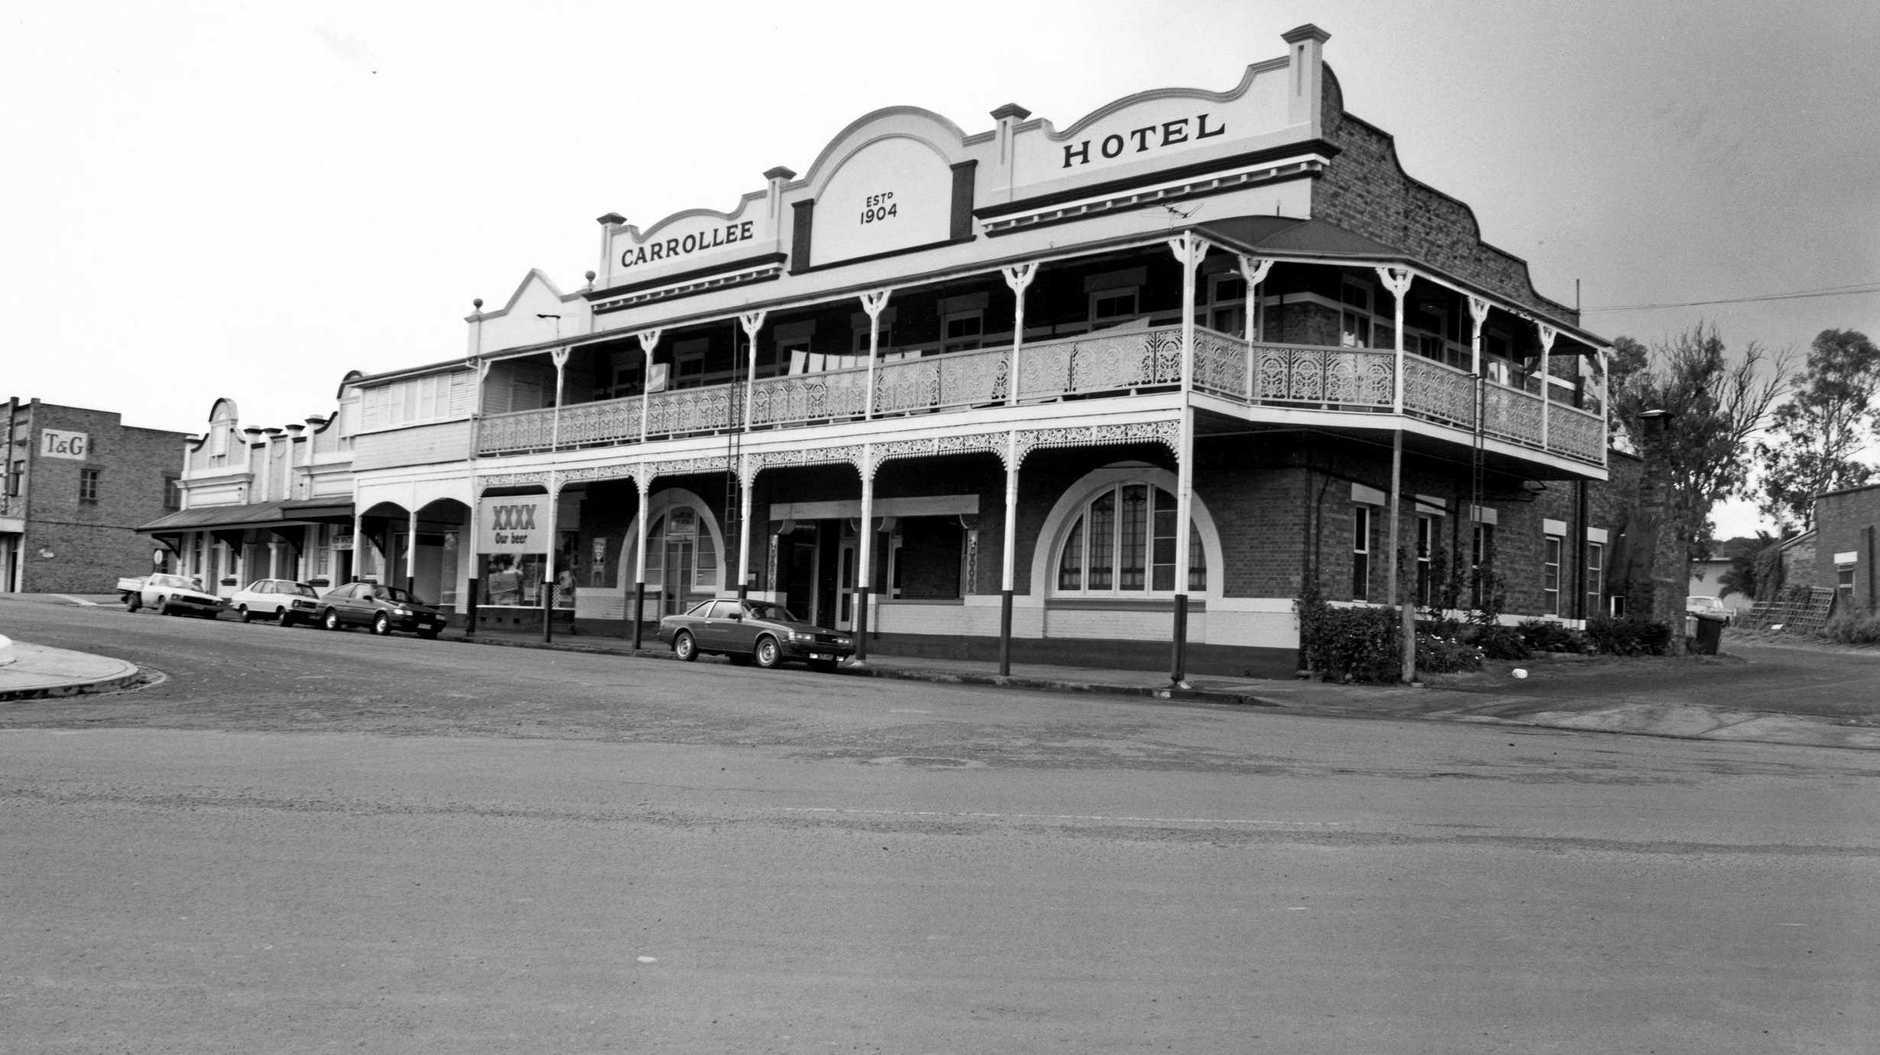 The Carrollee Hotel in Kingaroy, Queensland in 1983.